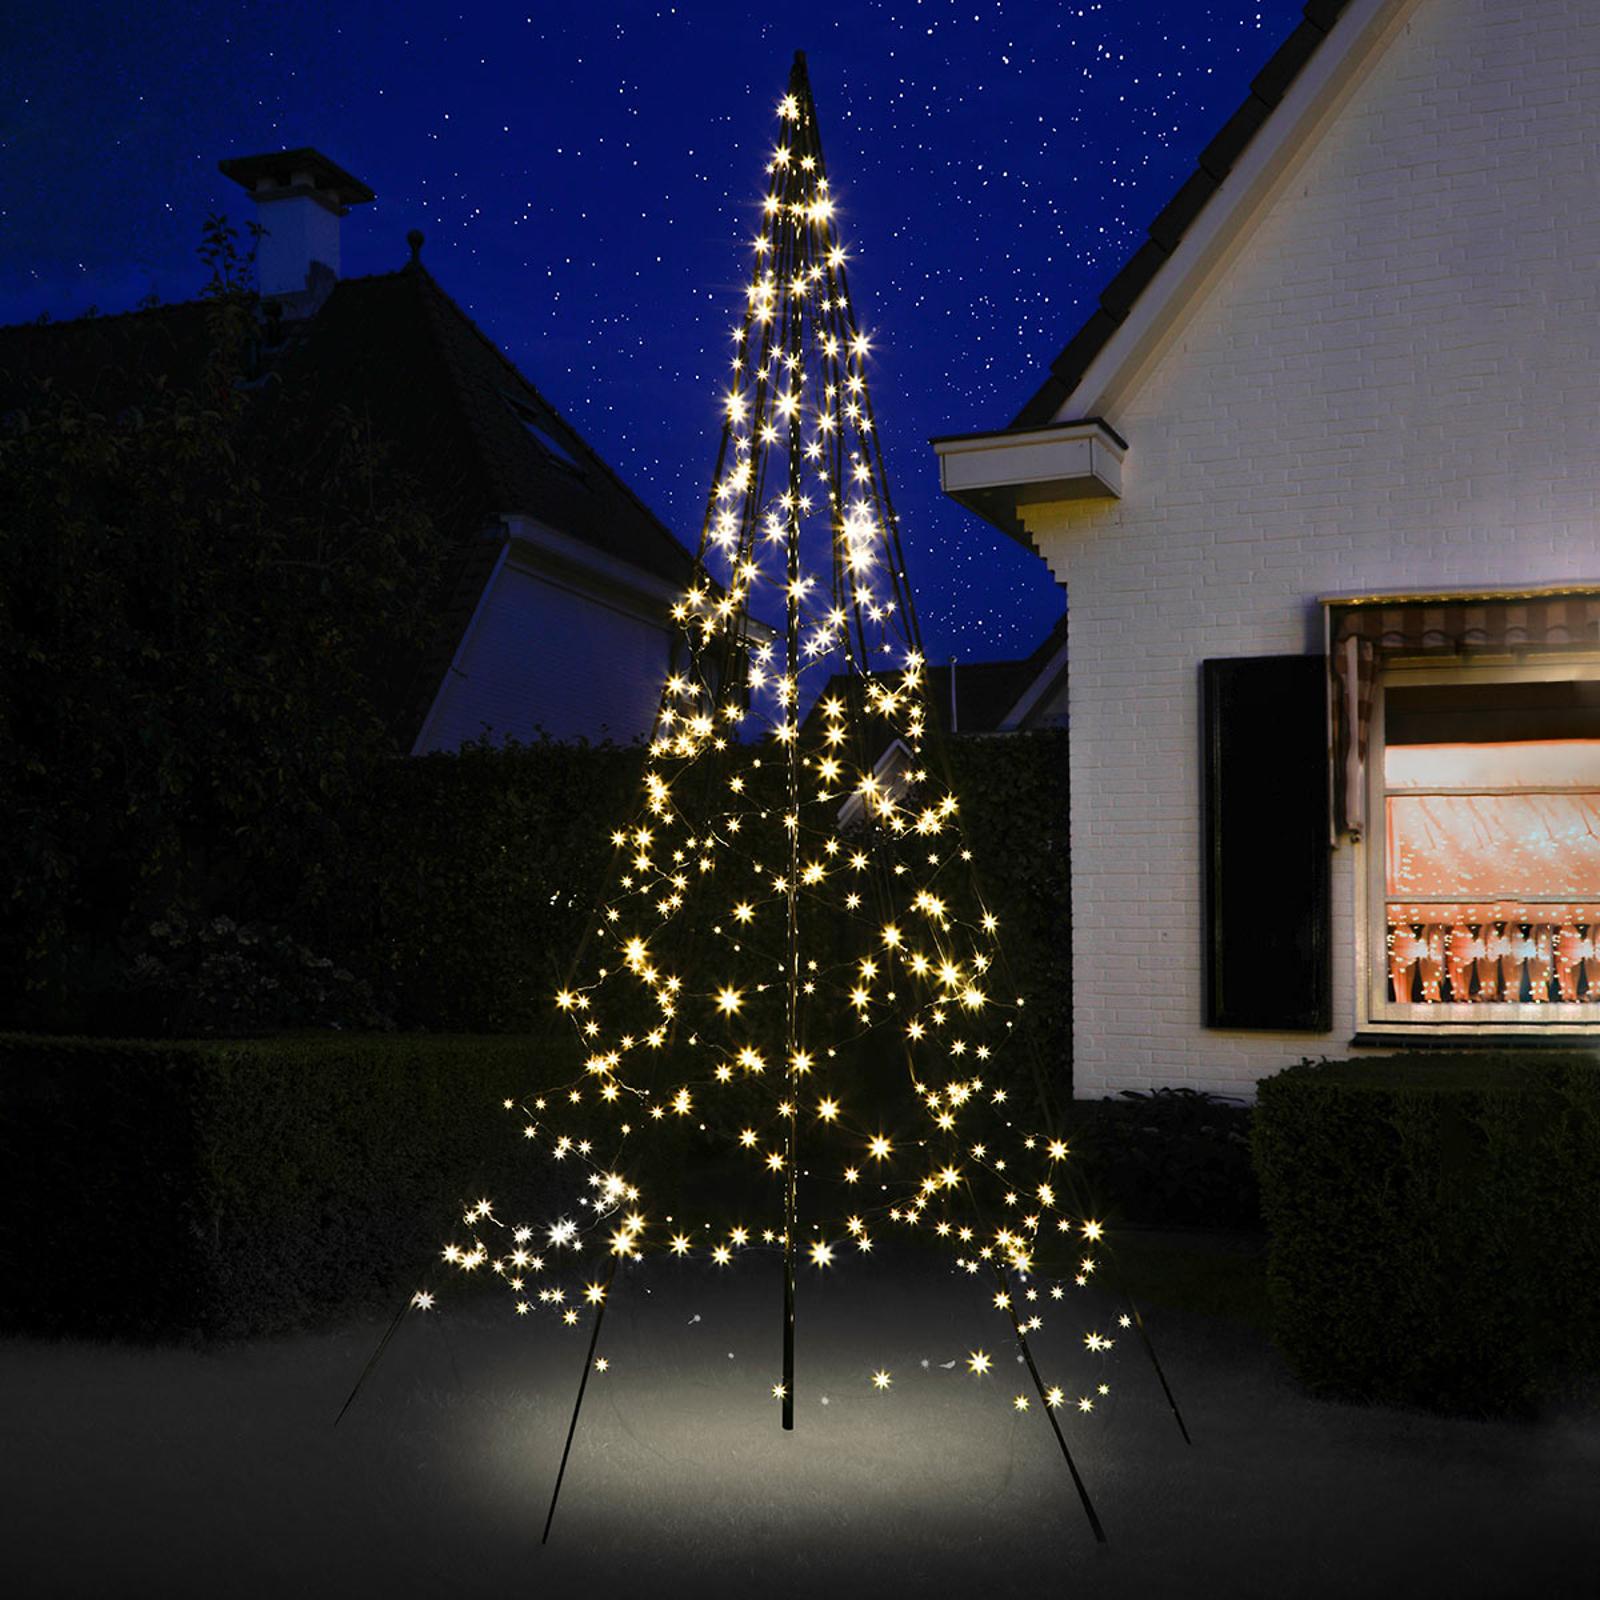 Fairybell® choinka z masztem, 3m, 360 diod LED